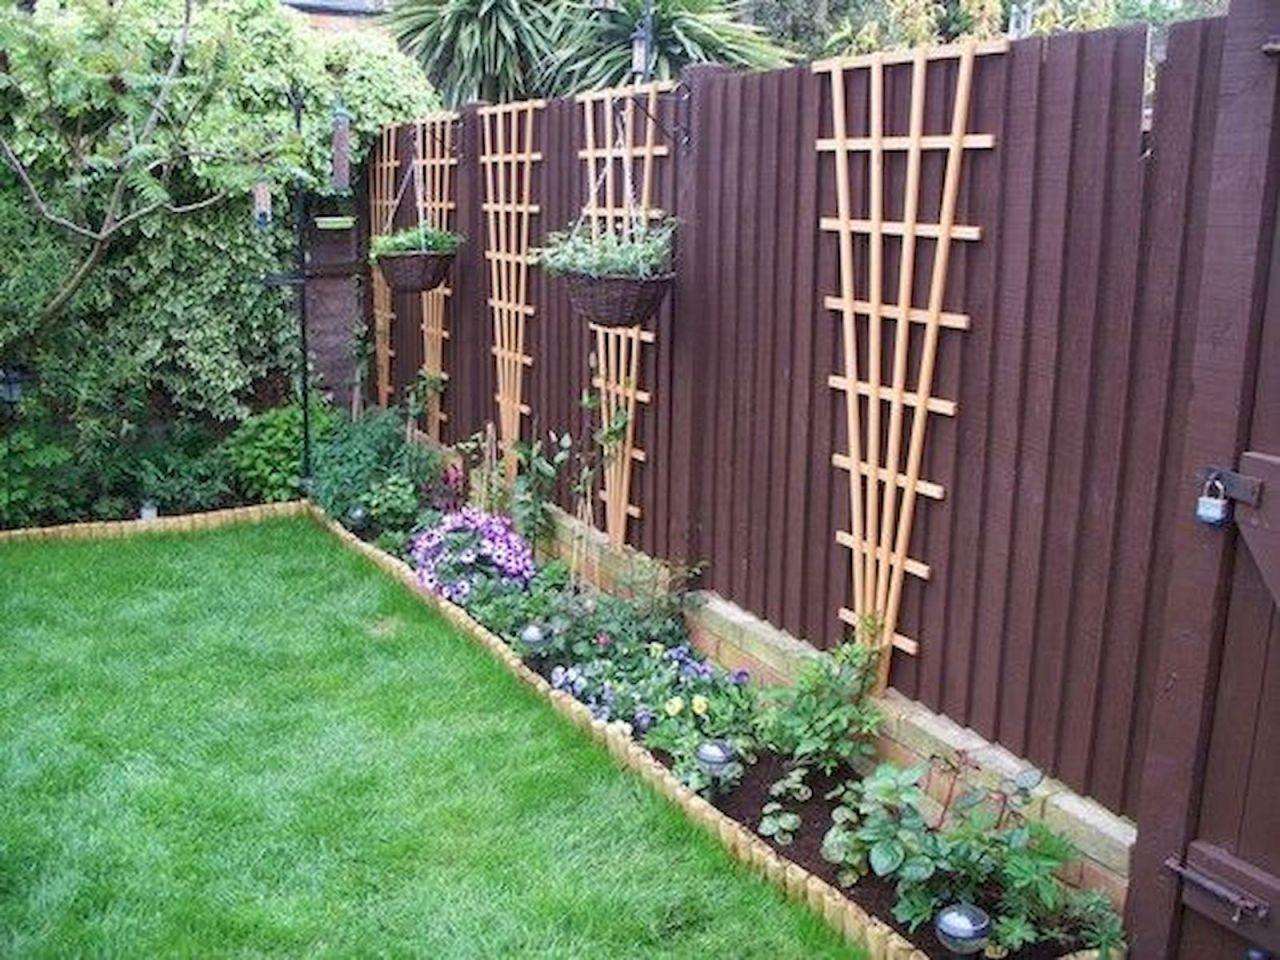 50 Fabulous Side Yard Garden Design Ideas And Remodel 40 Minimalist Garden Small Garden Design Backyard Garden Design